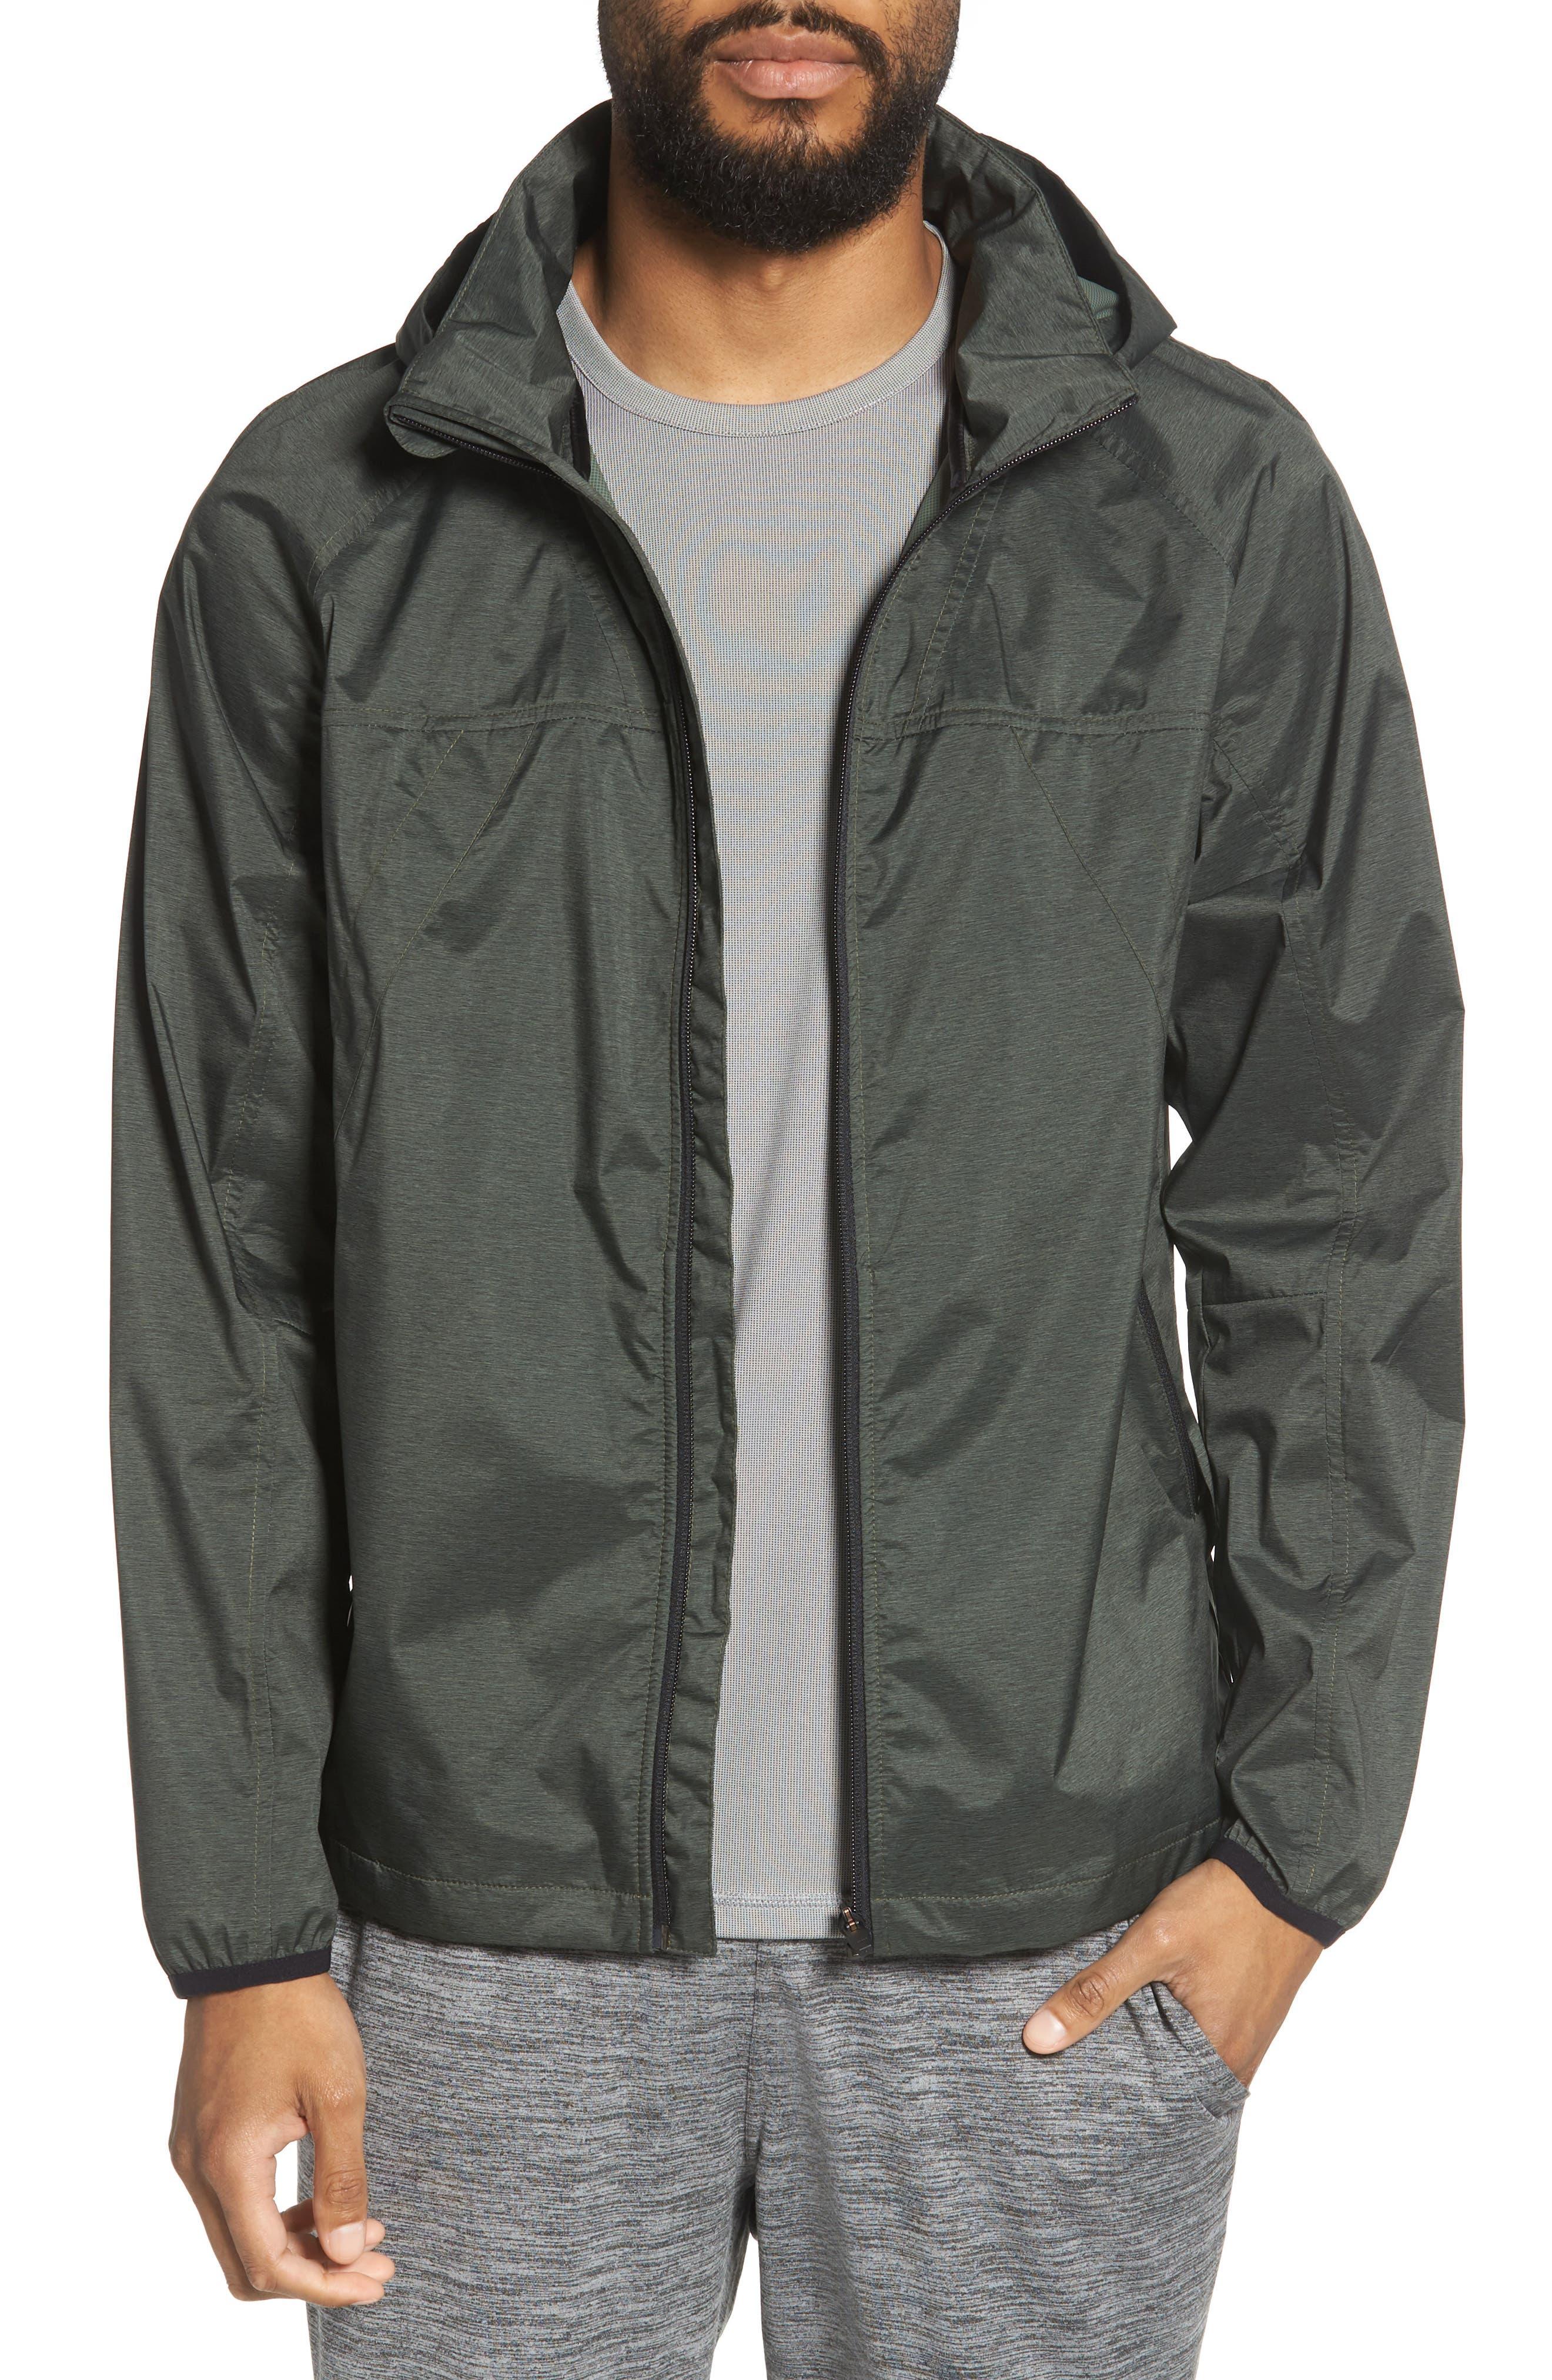 Xieite Hooded Jacket,                         Main,                         color, GREEN TACTICAL MELANGE